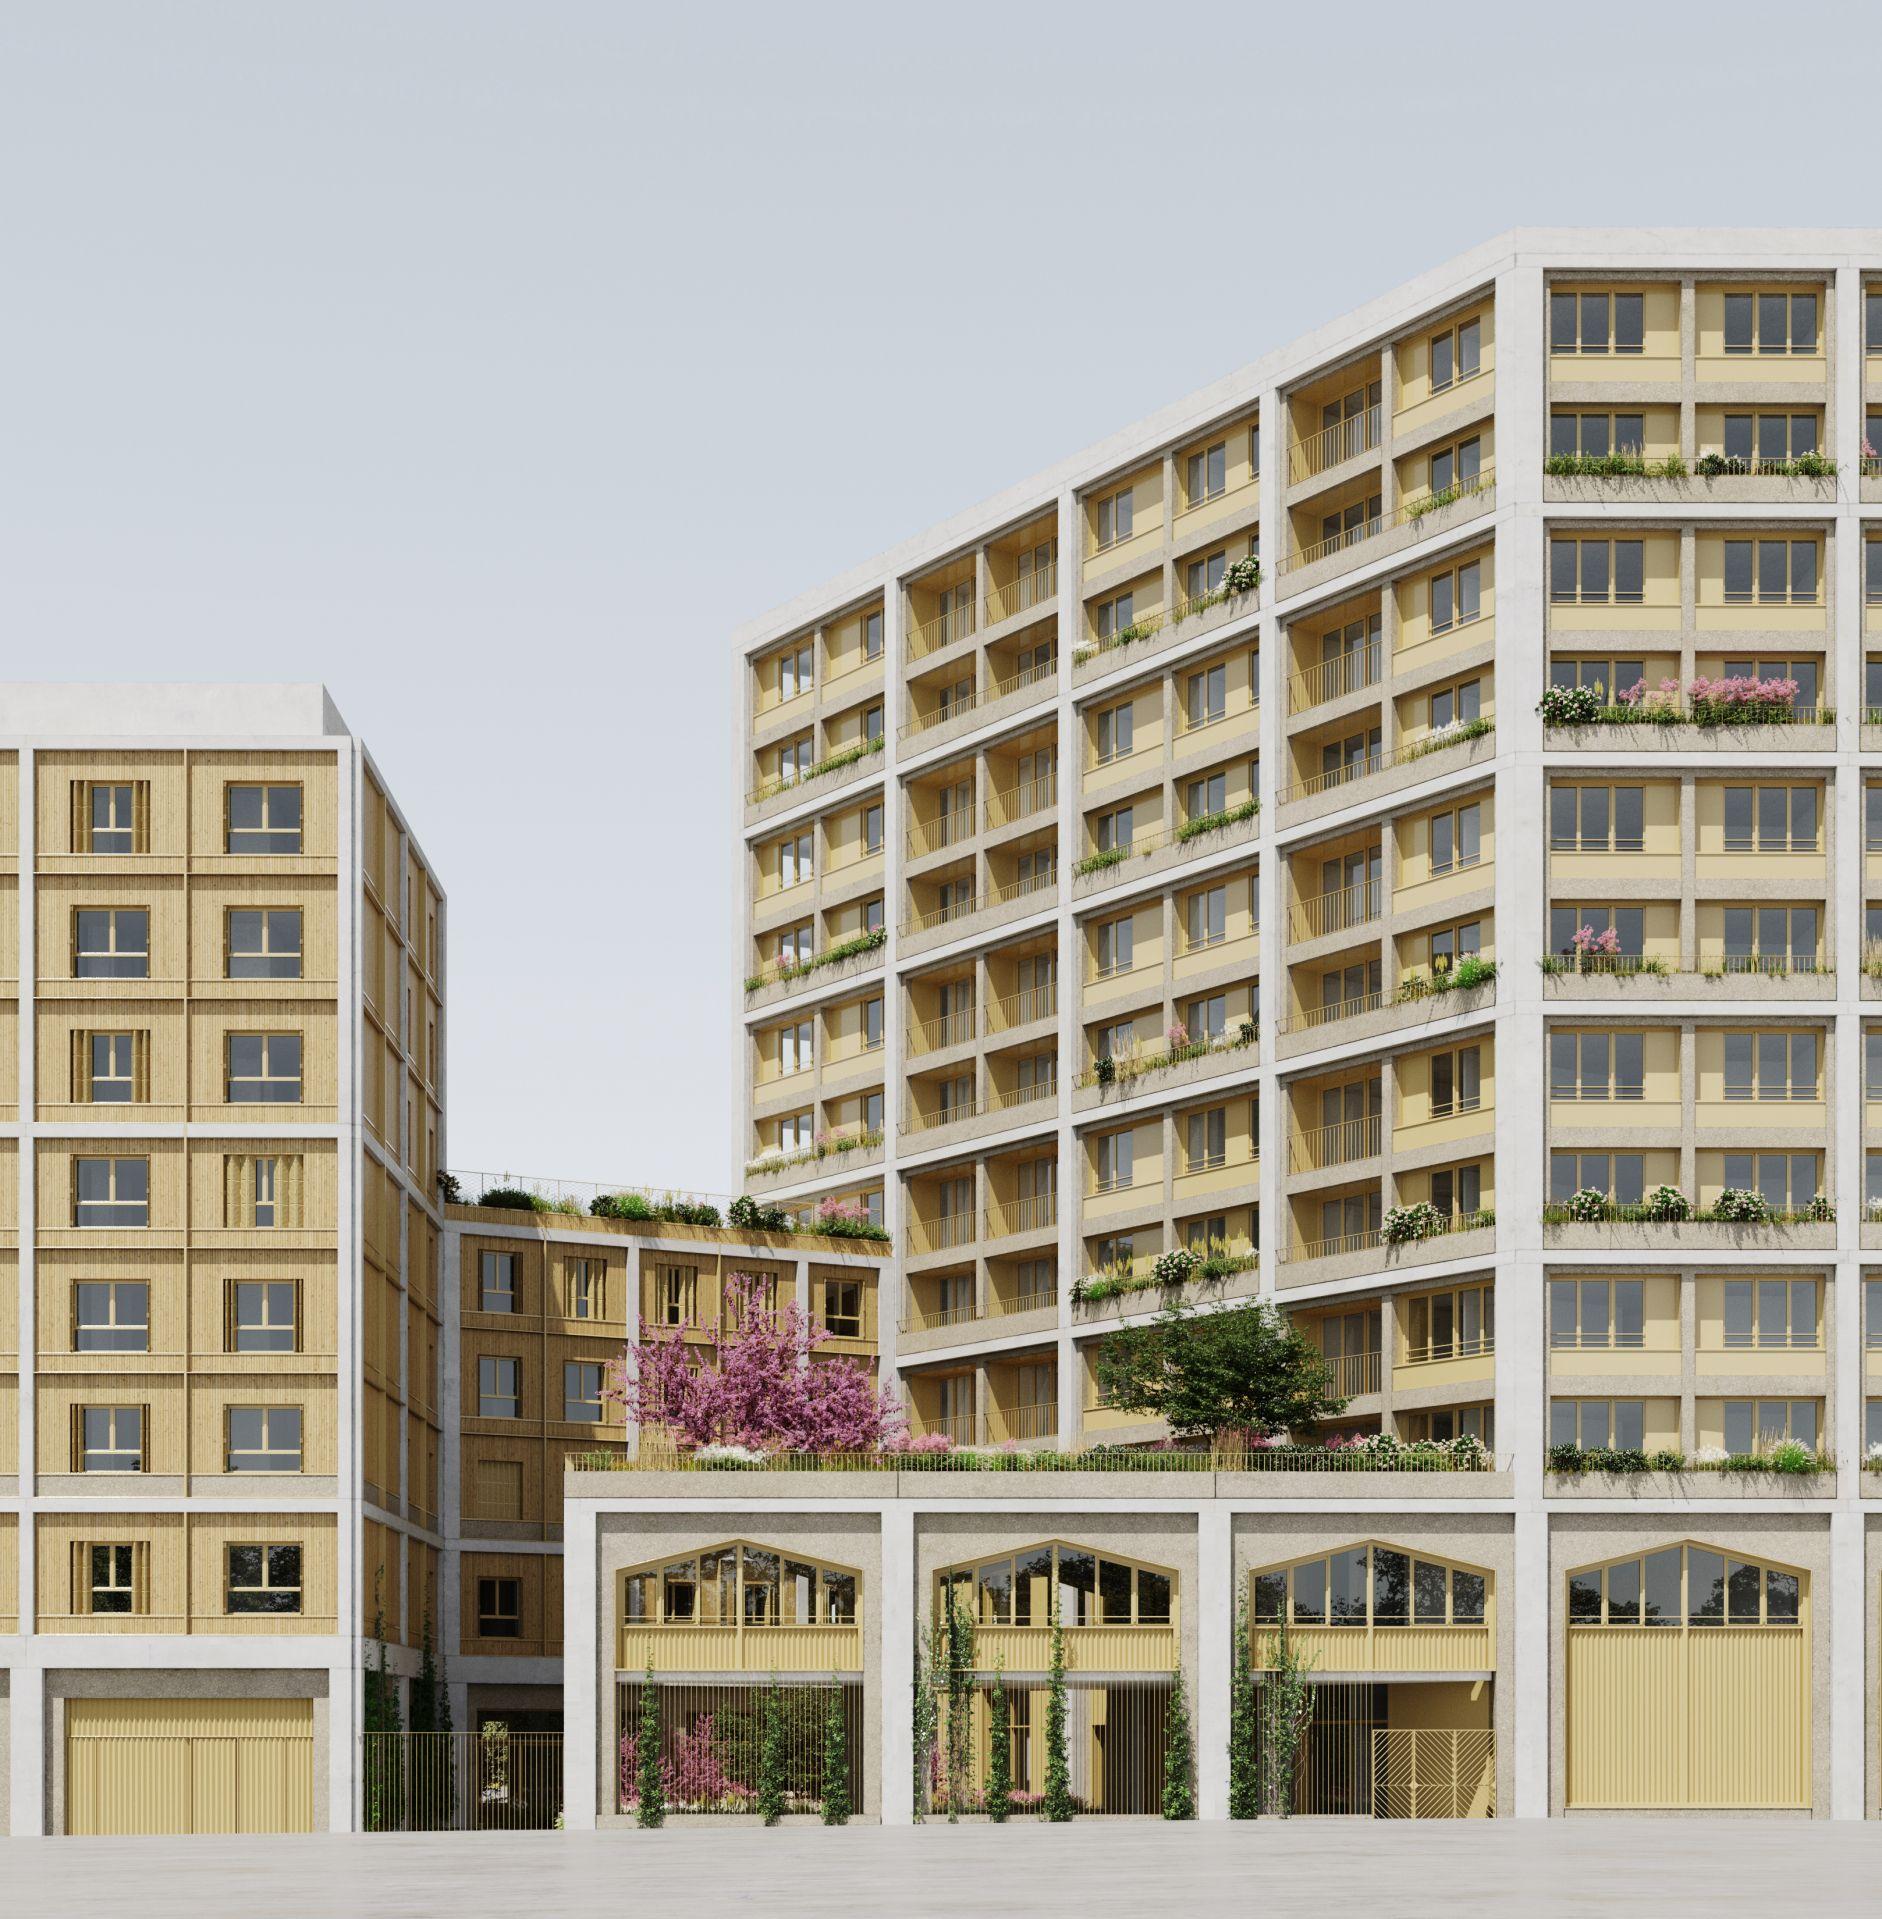 Supervue la architecture lgt zac paul bourget cropMedium